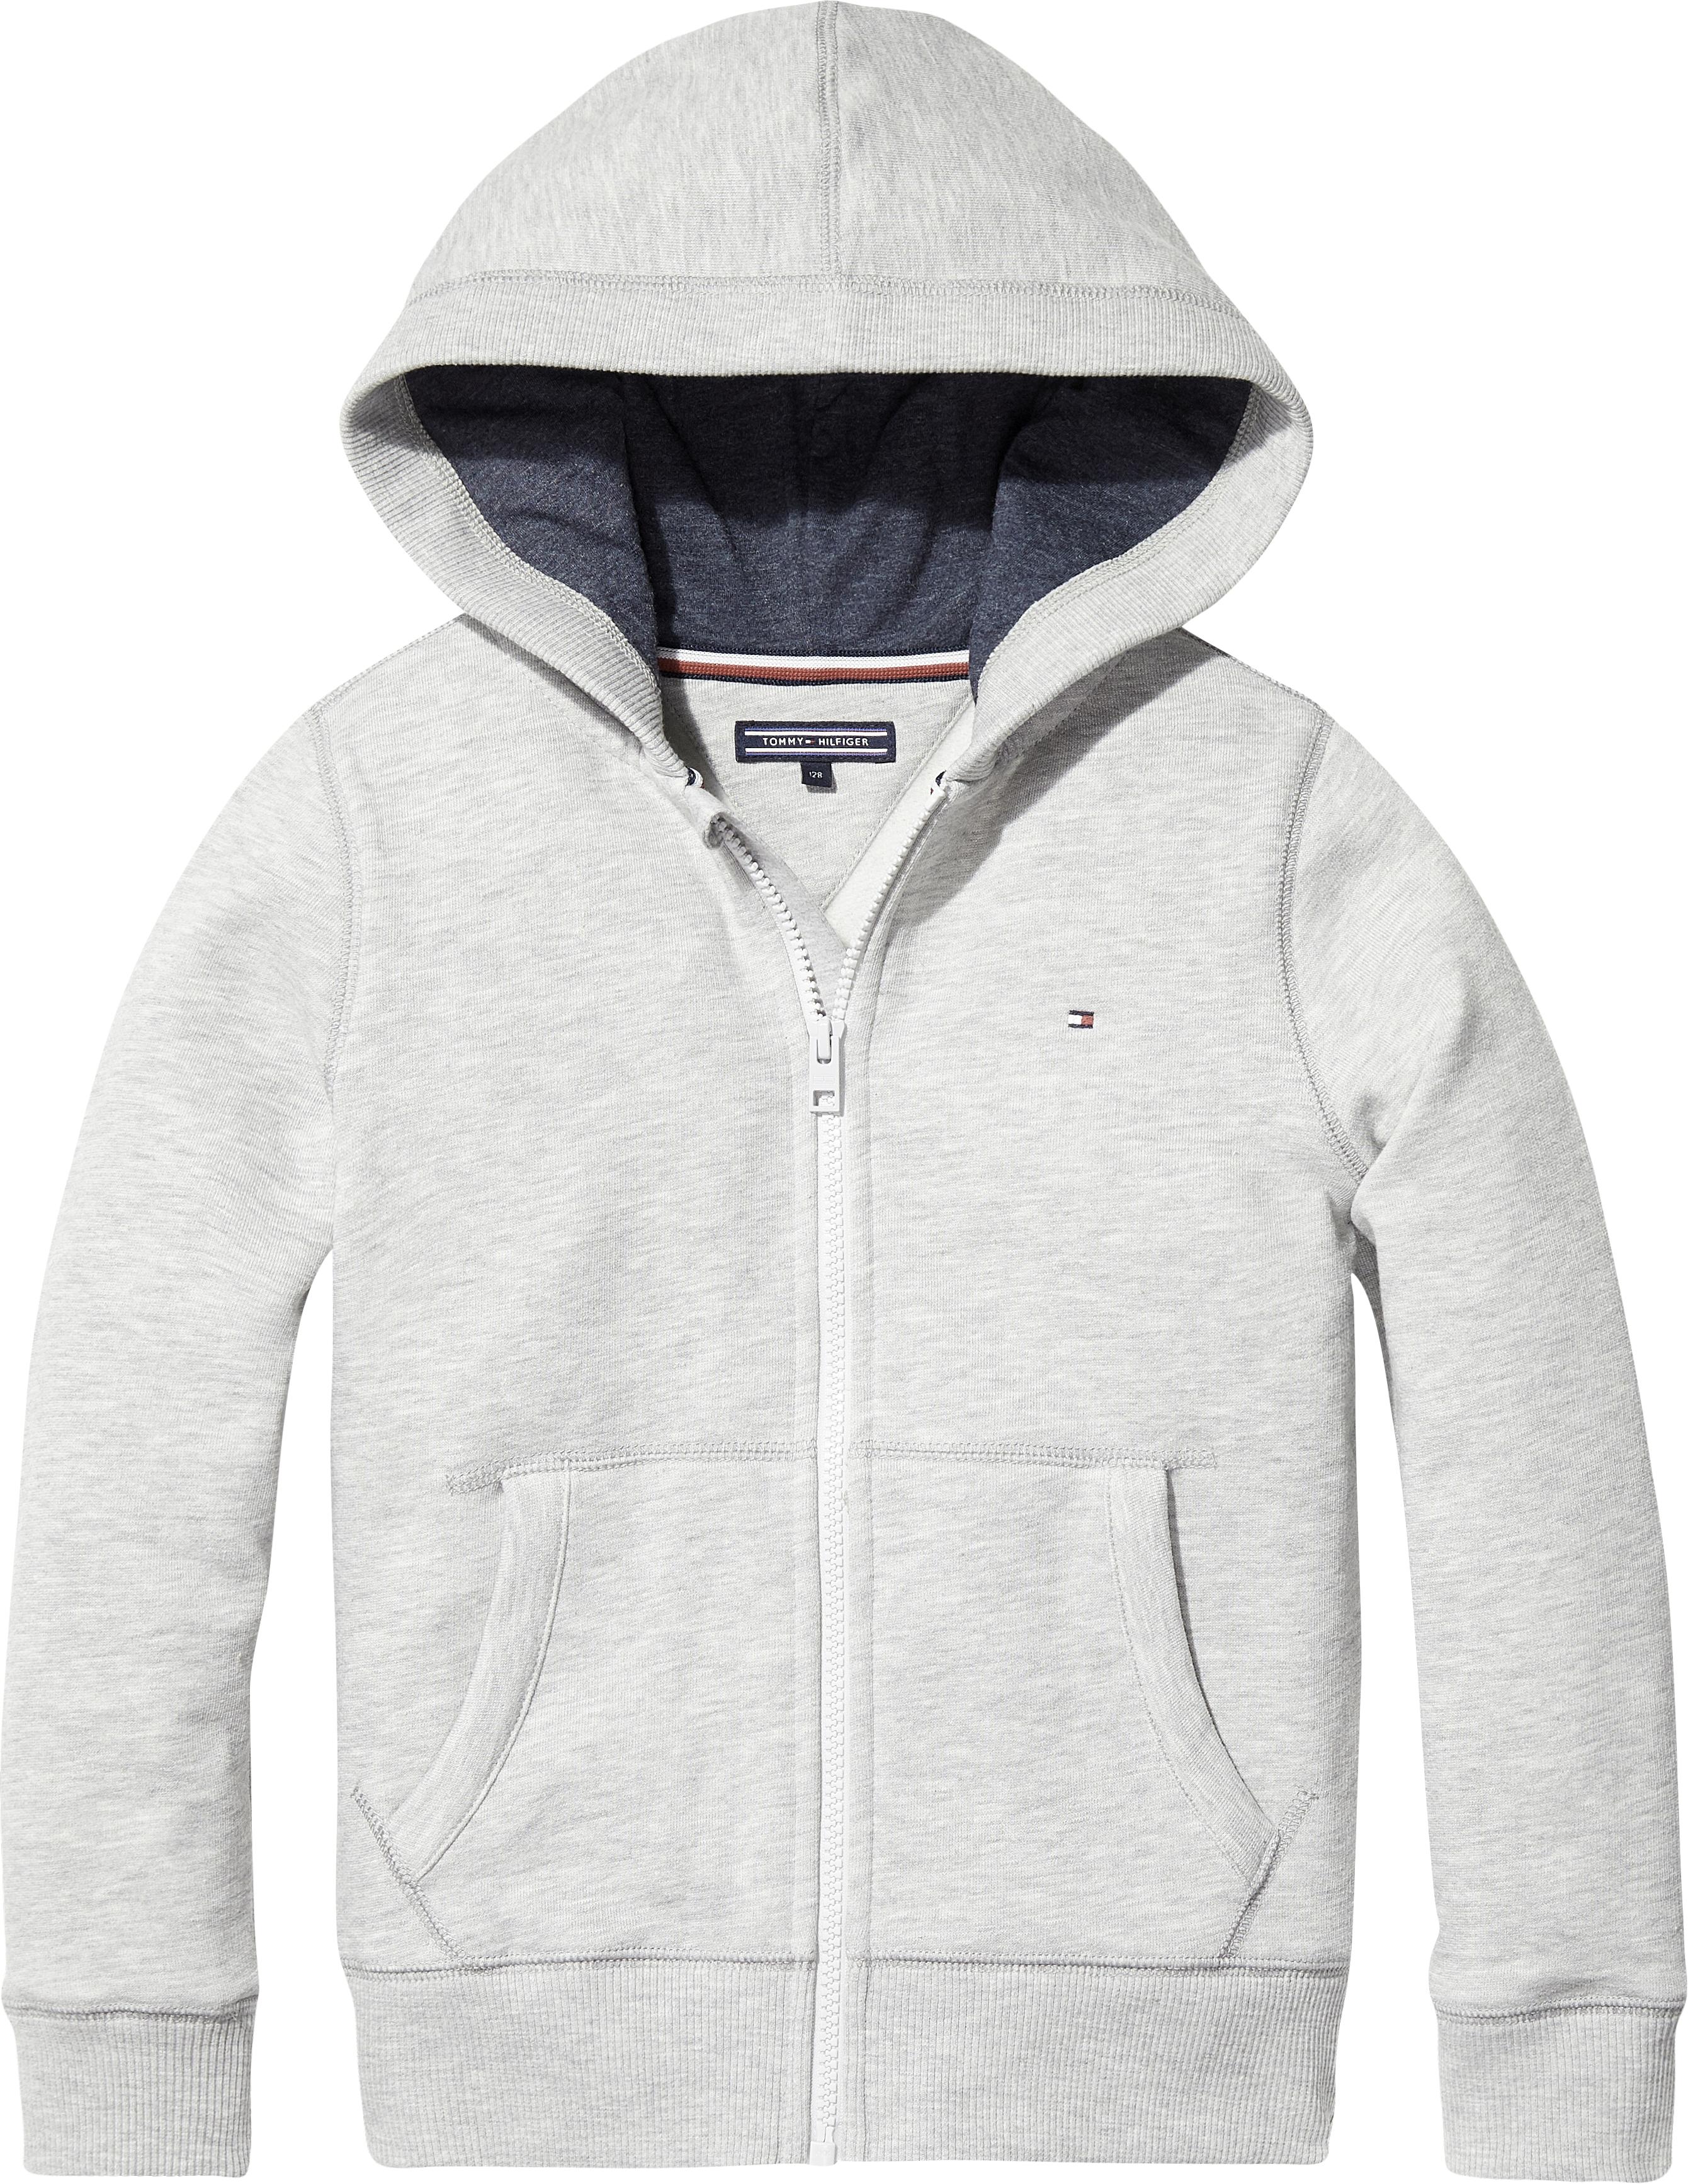 Tommy Hilfiger Basic zip hoodie, grå, 10 år